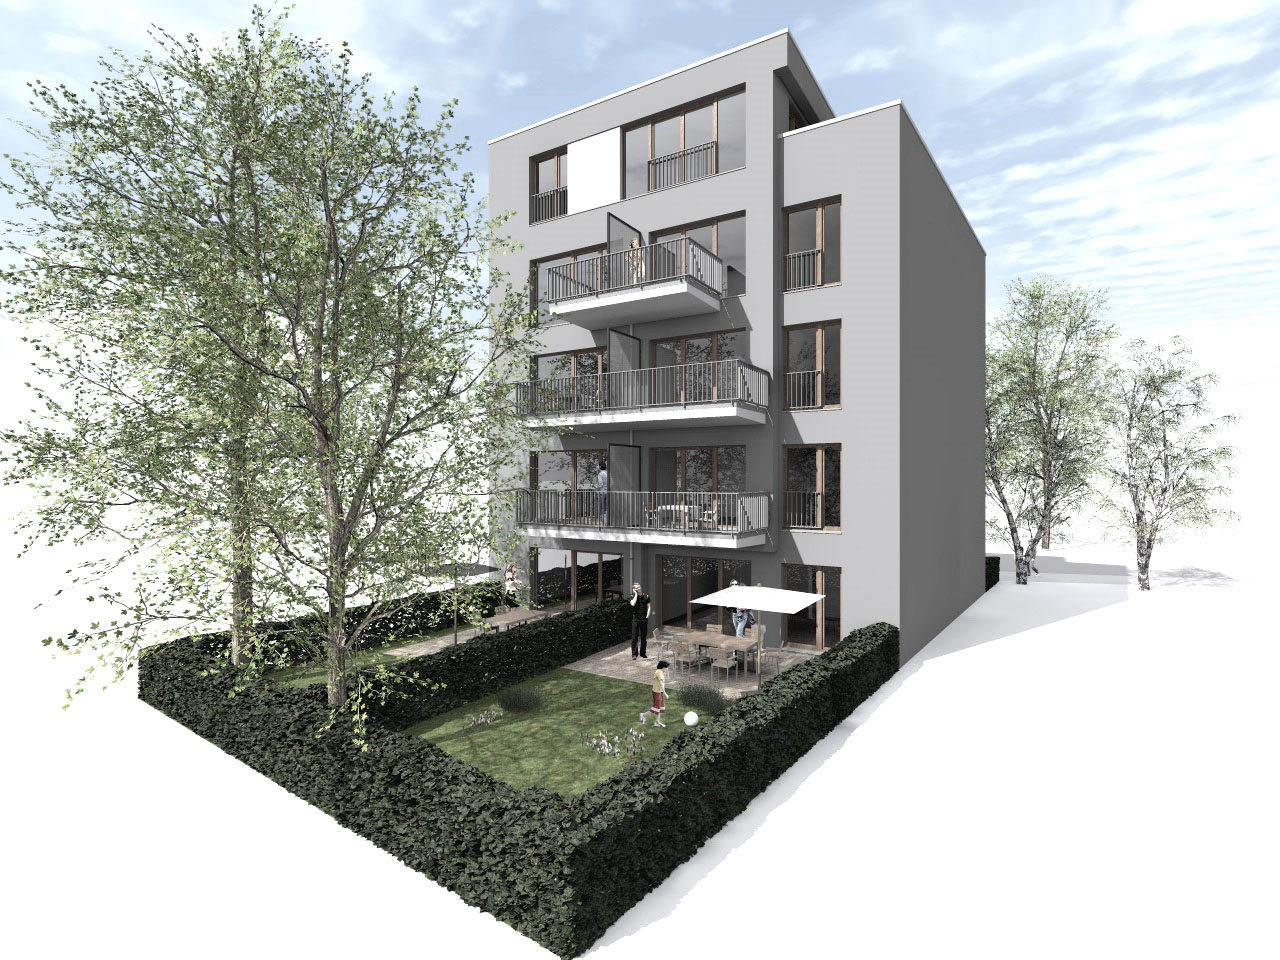 Projektstudie Wohngebäude Hamburg